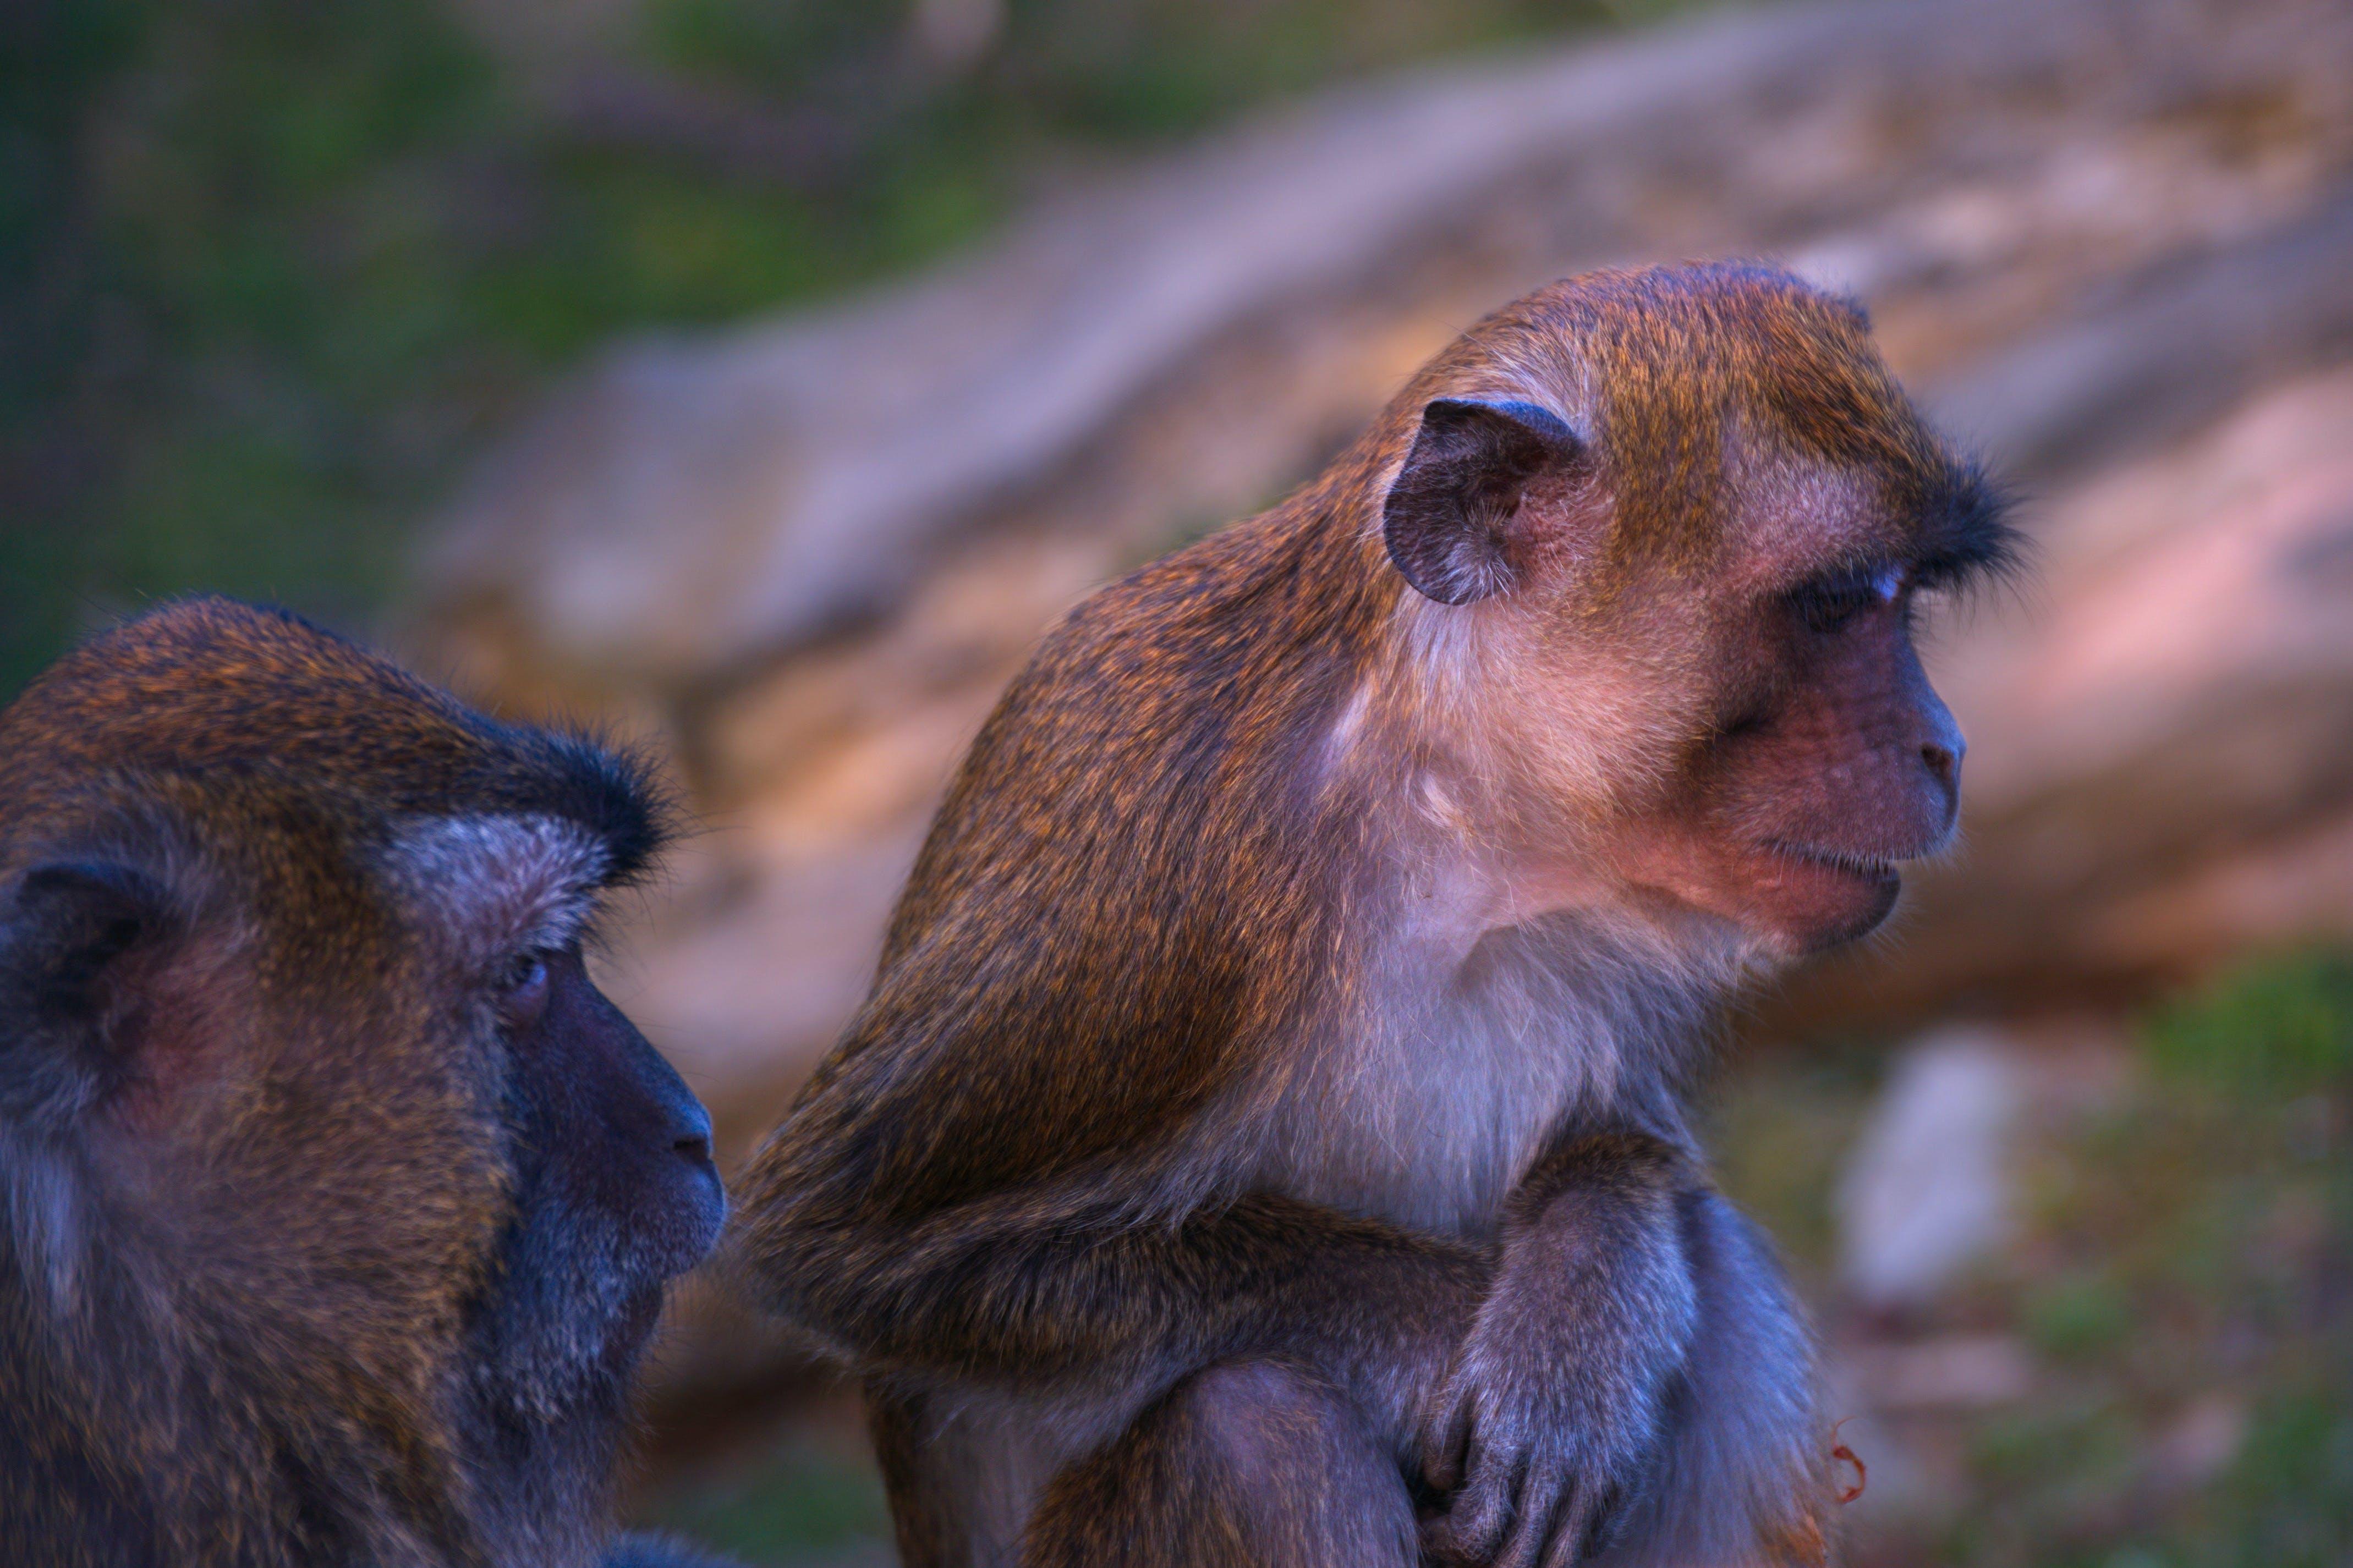 Free stock photo of cute animals, monkeys, wild animals